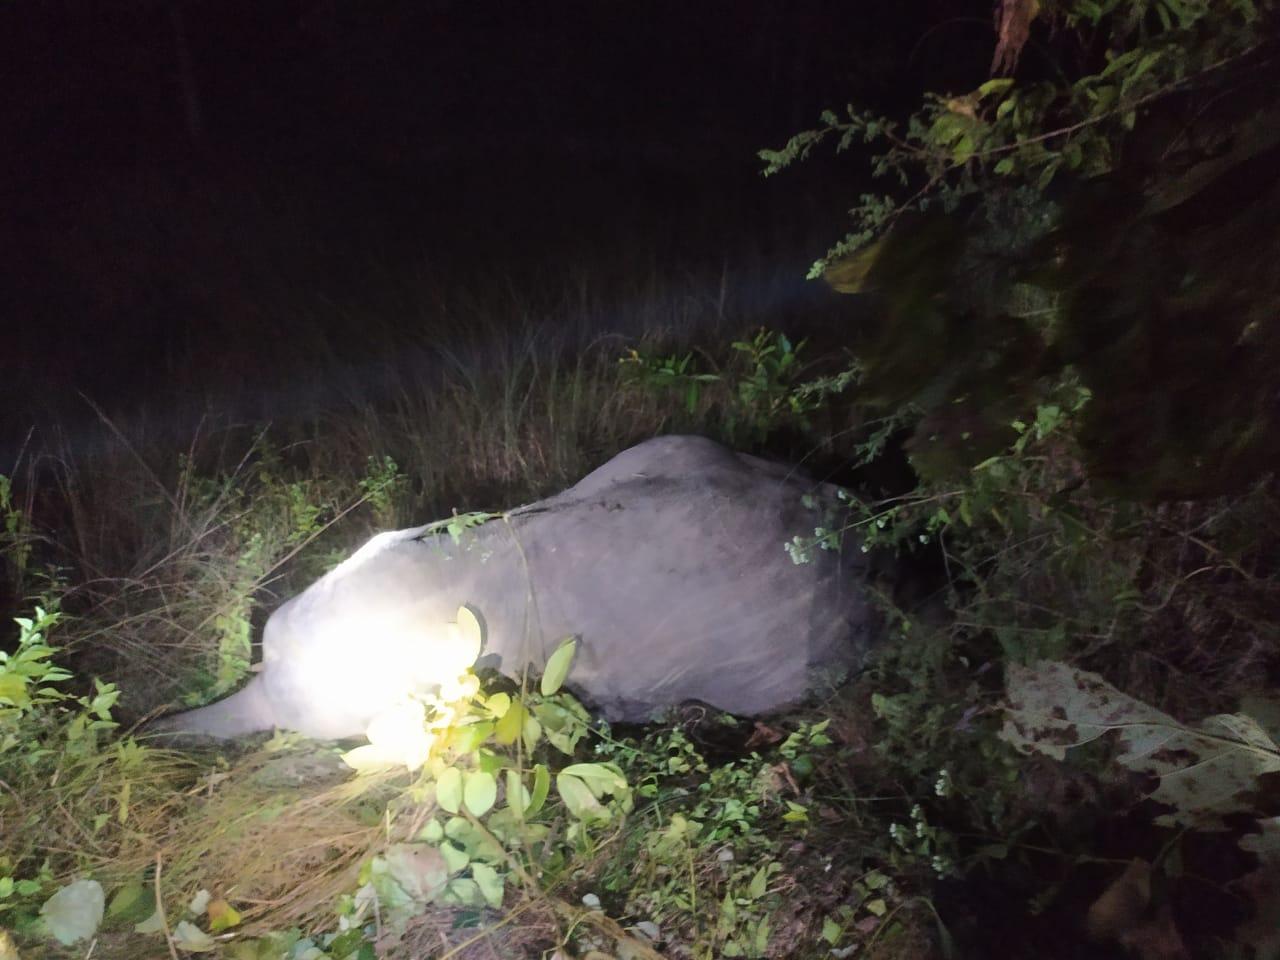 Elephant Killed In Jujumura Hit By BBSR RKl Intercity Express